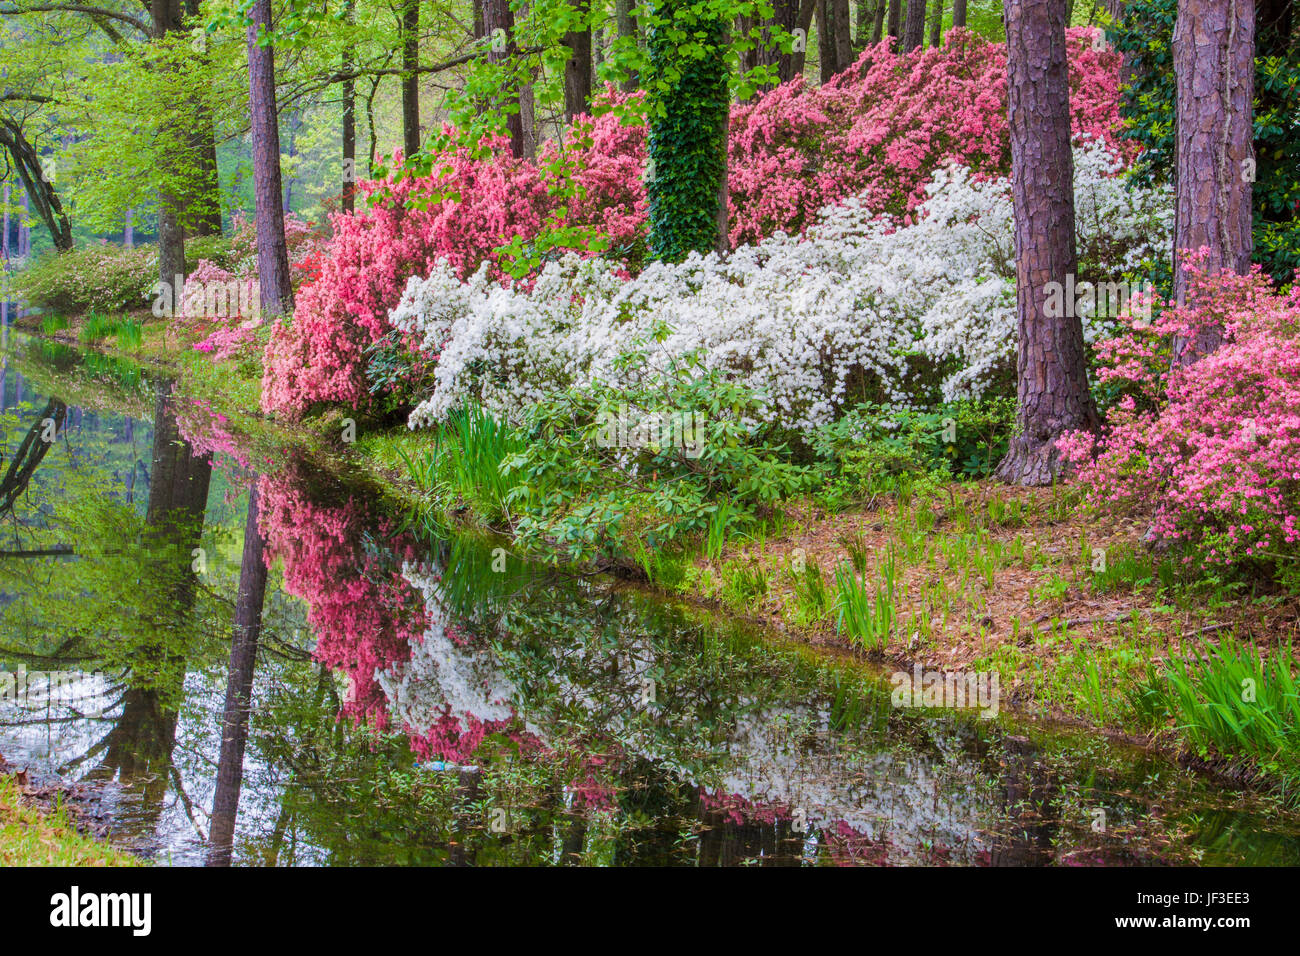 Azalea Overlook Garden At Callaway Gardens In Pine Mountain, Georgia. Callaway  Gardens, Famous For Its Azaleas, Boasts 13,000 Acres Of Gardens.